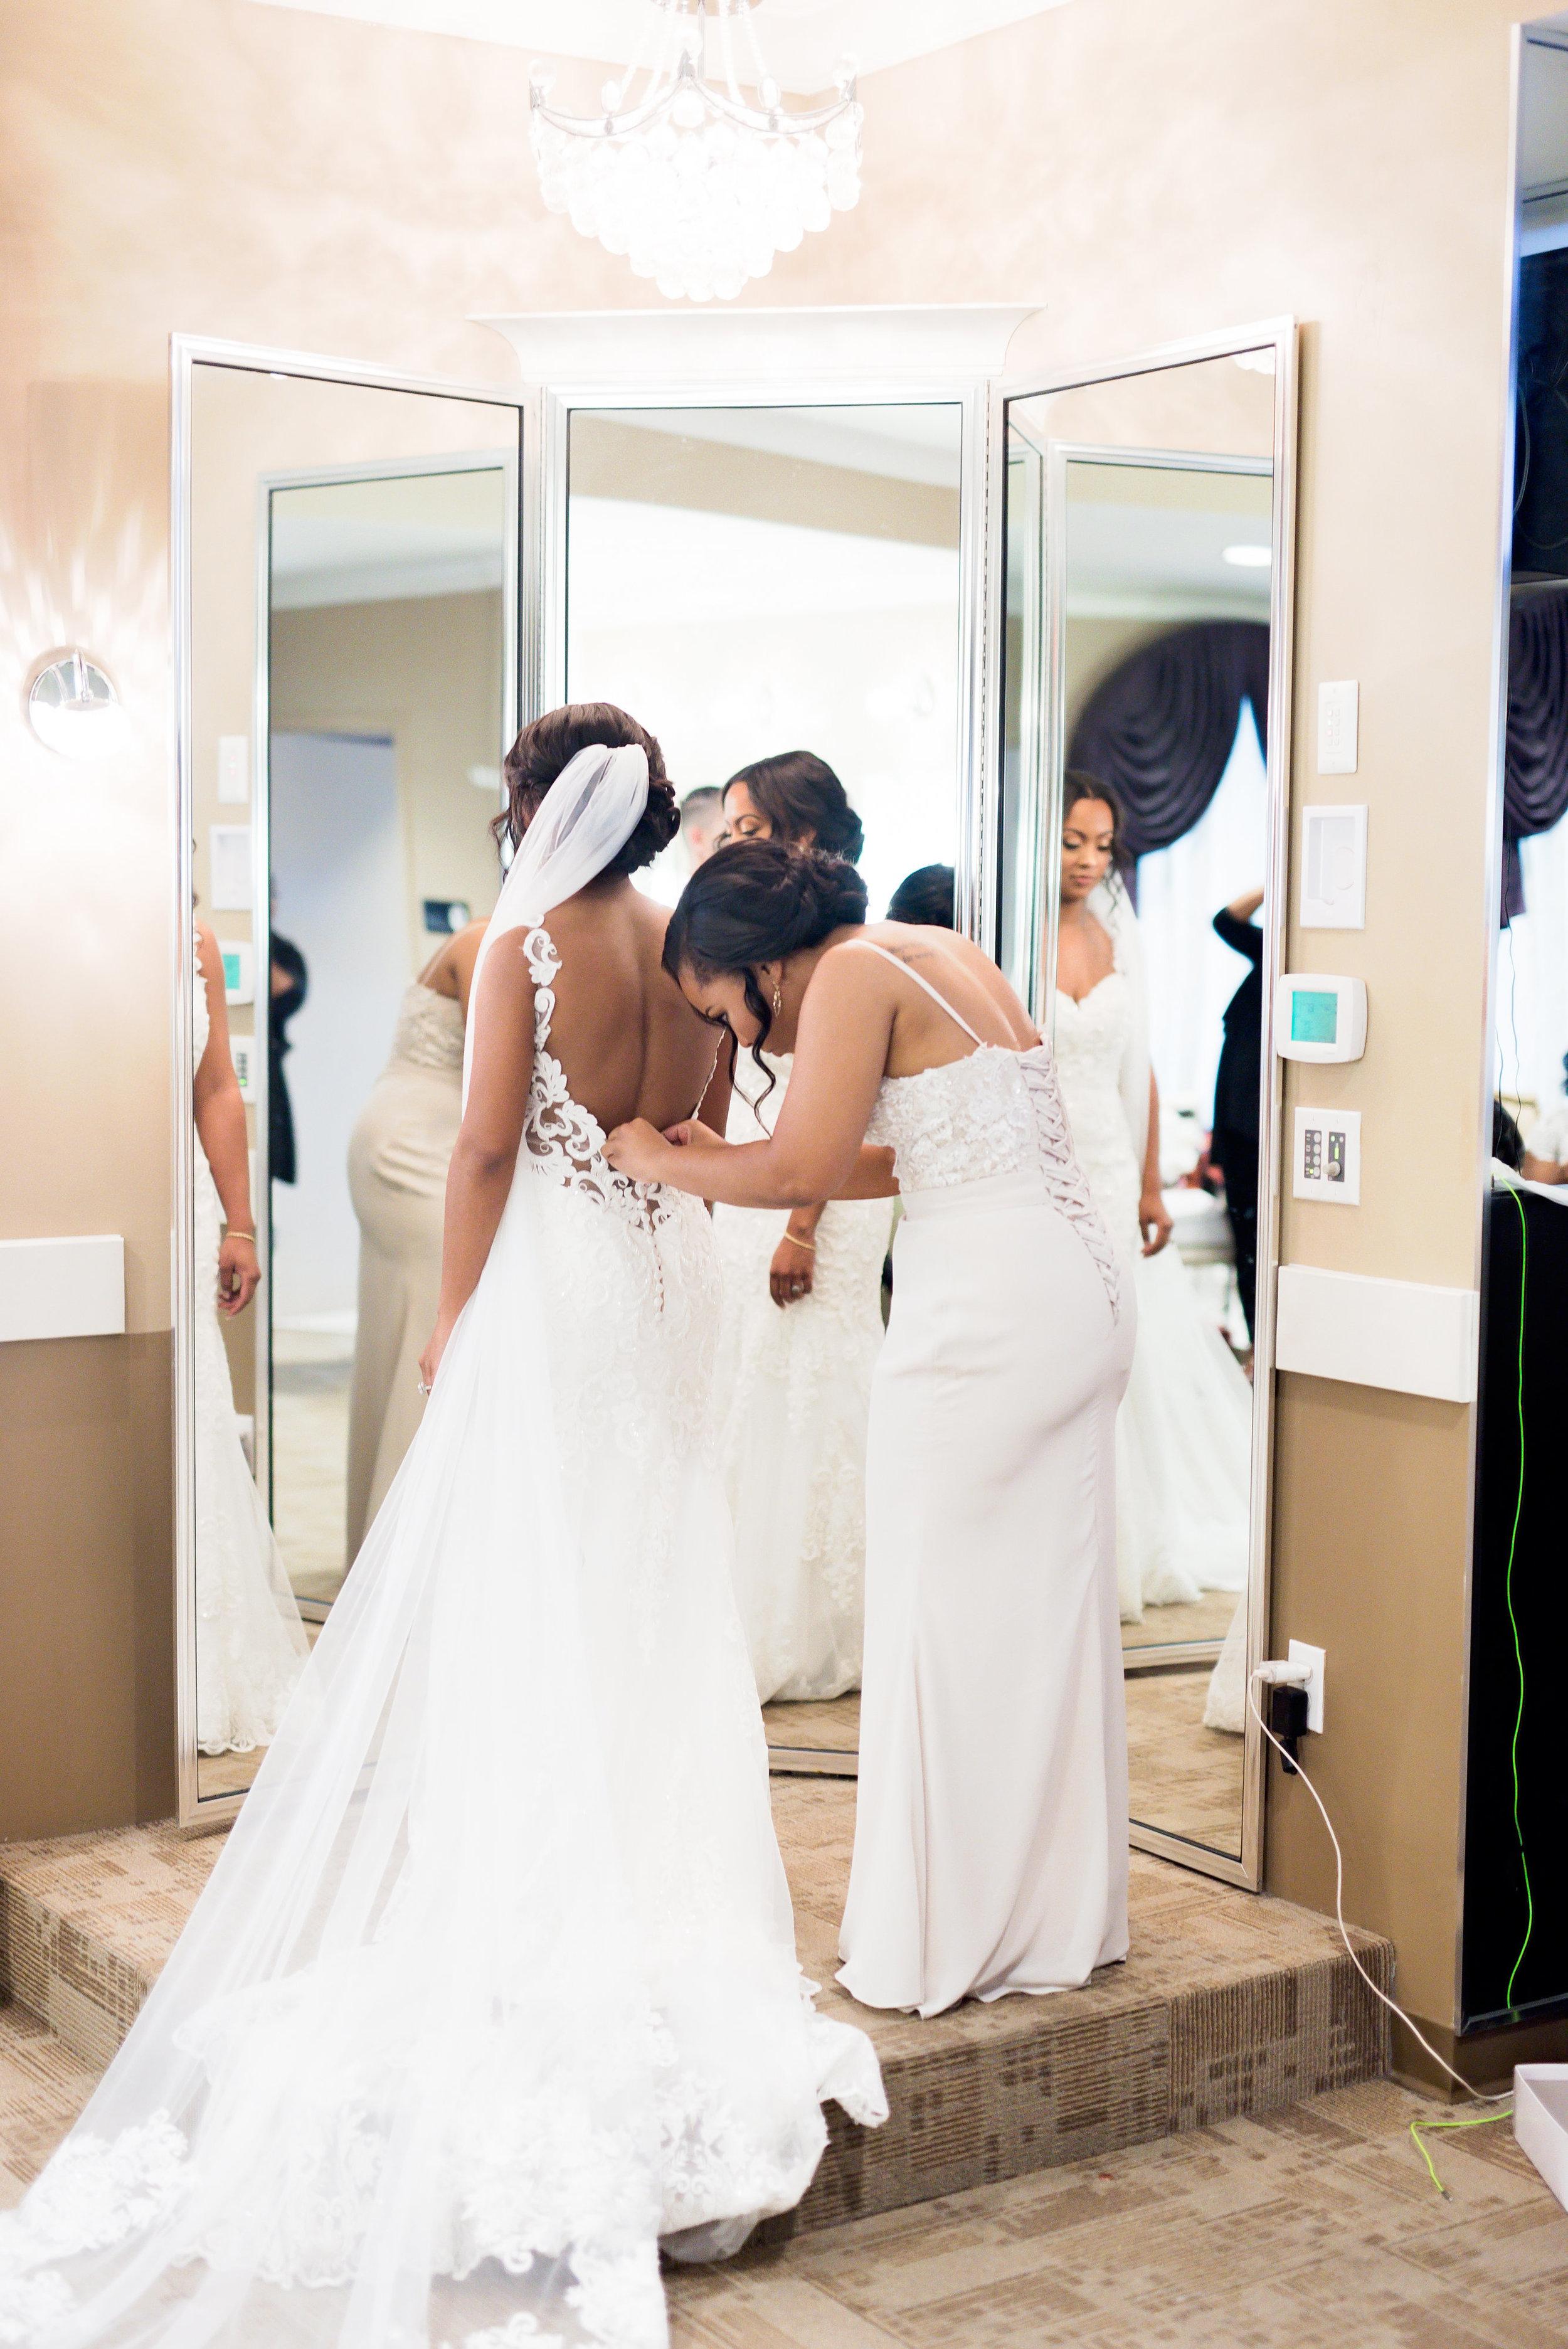 Dallas Wedding- Texas- Pharris Photography- Chelsea + Aaron- Bride- Wedding Gown